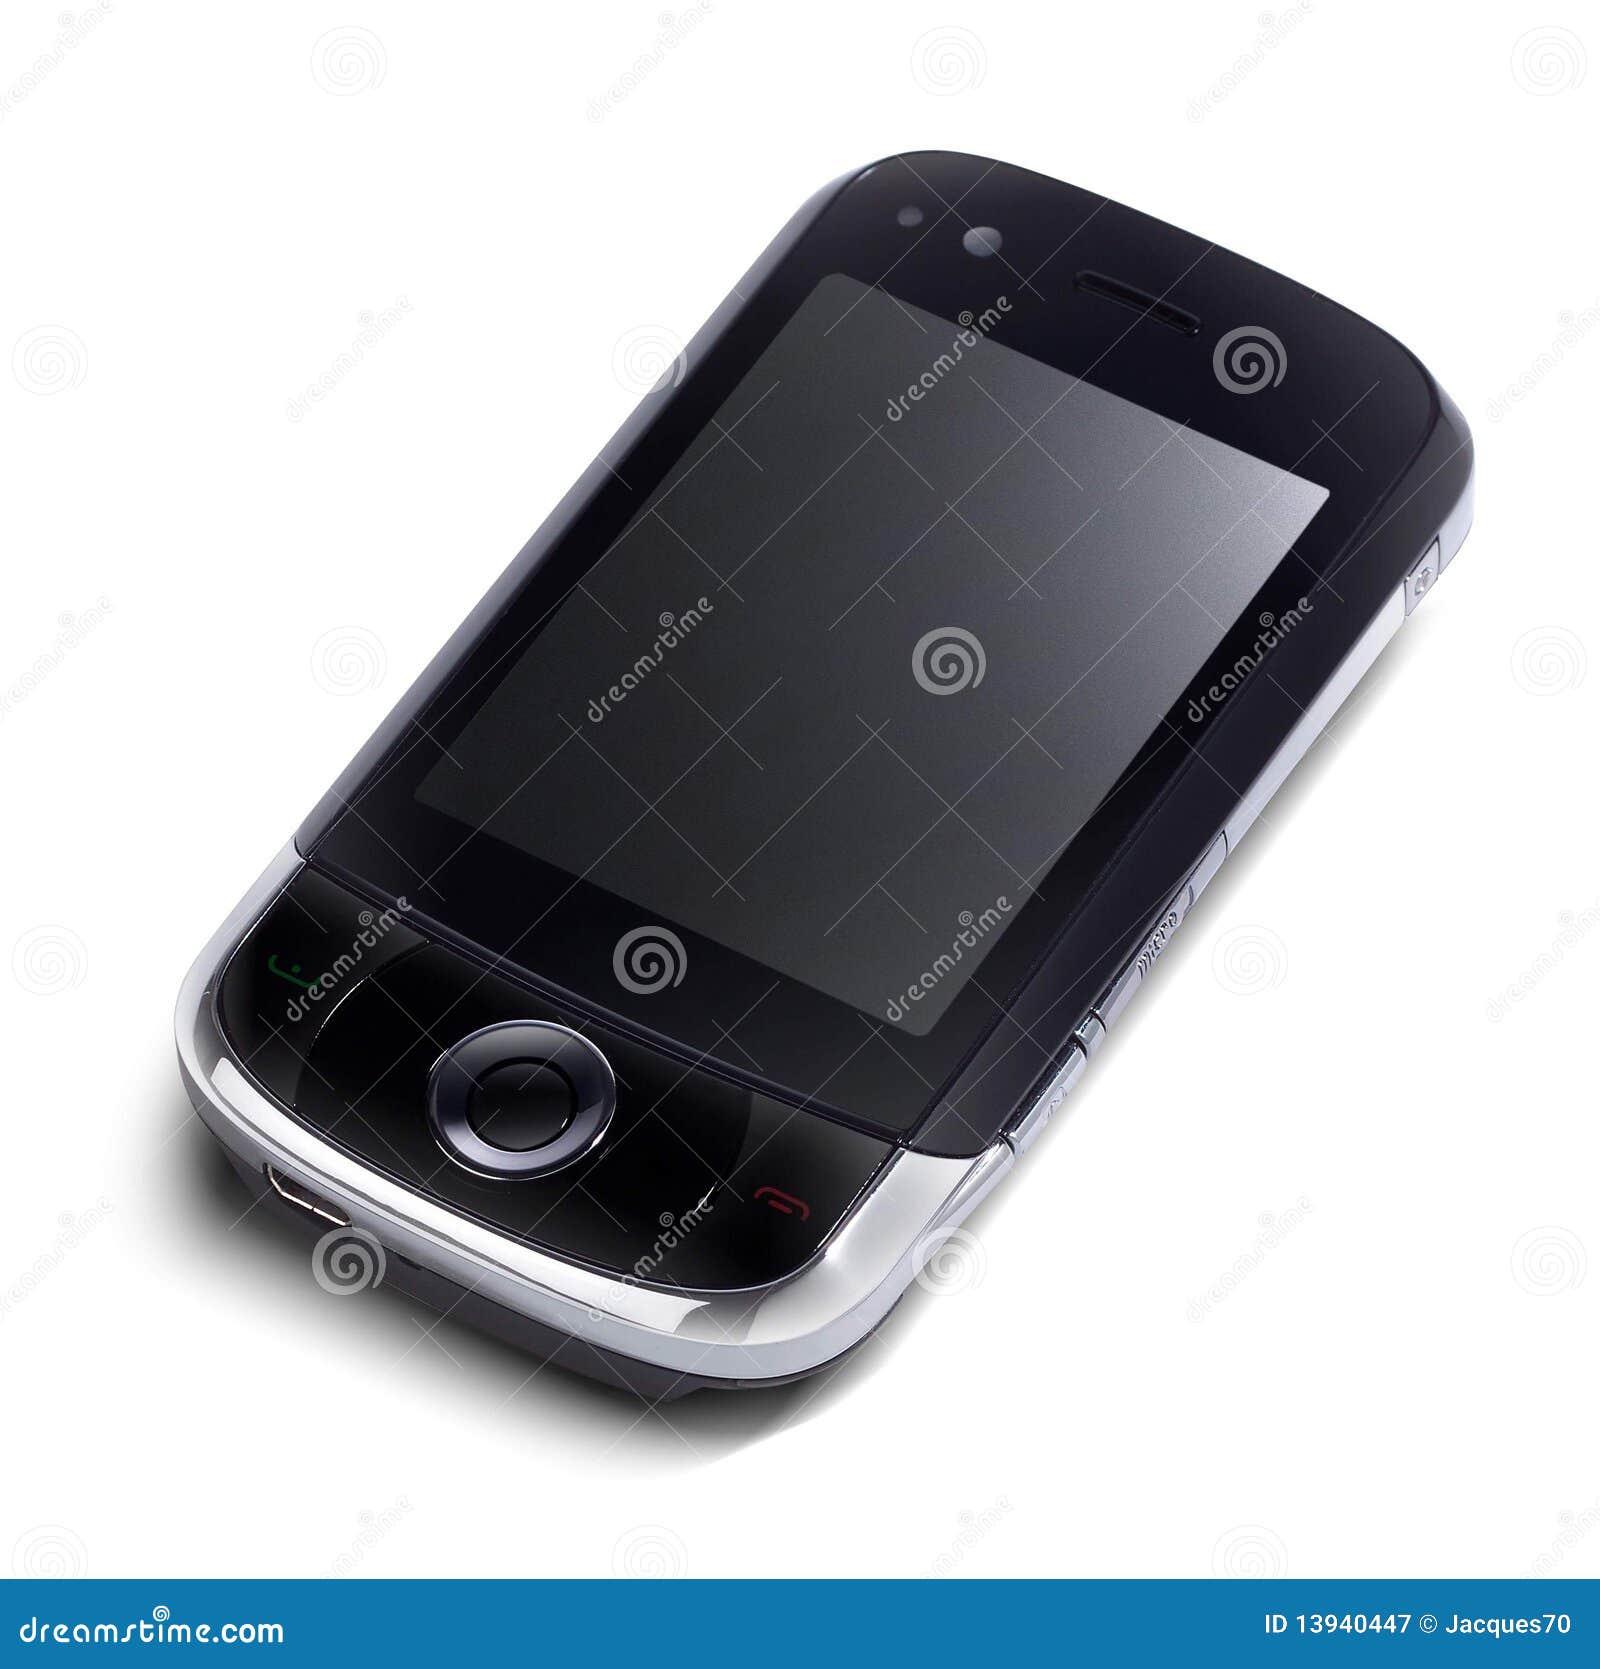 Mobile phone - Portable phone